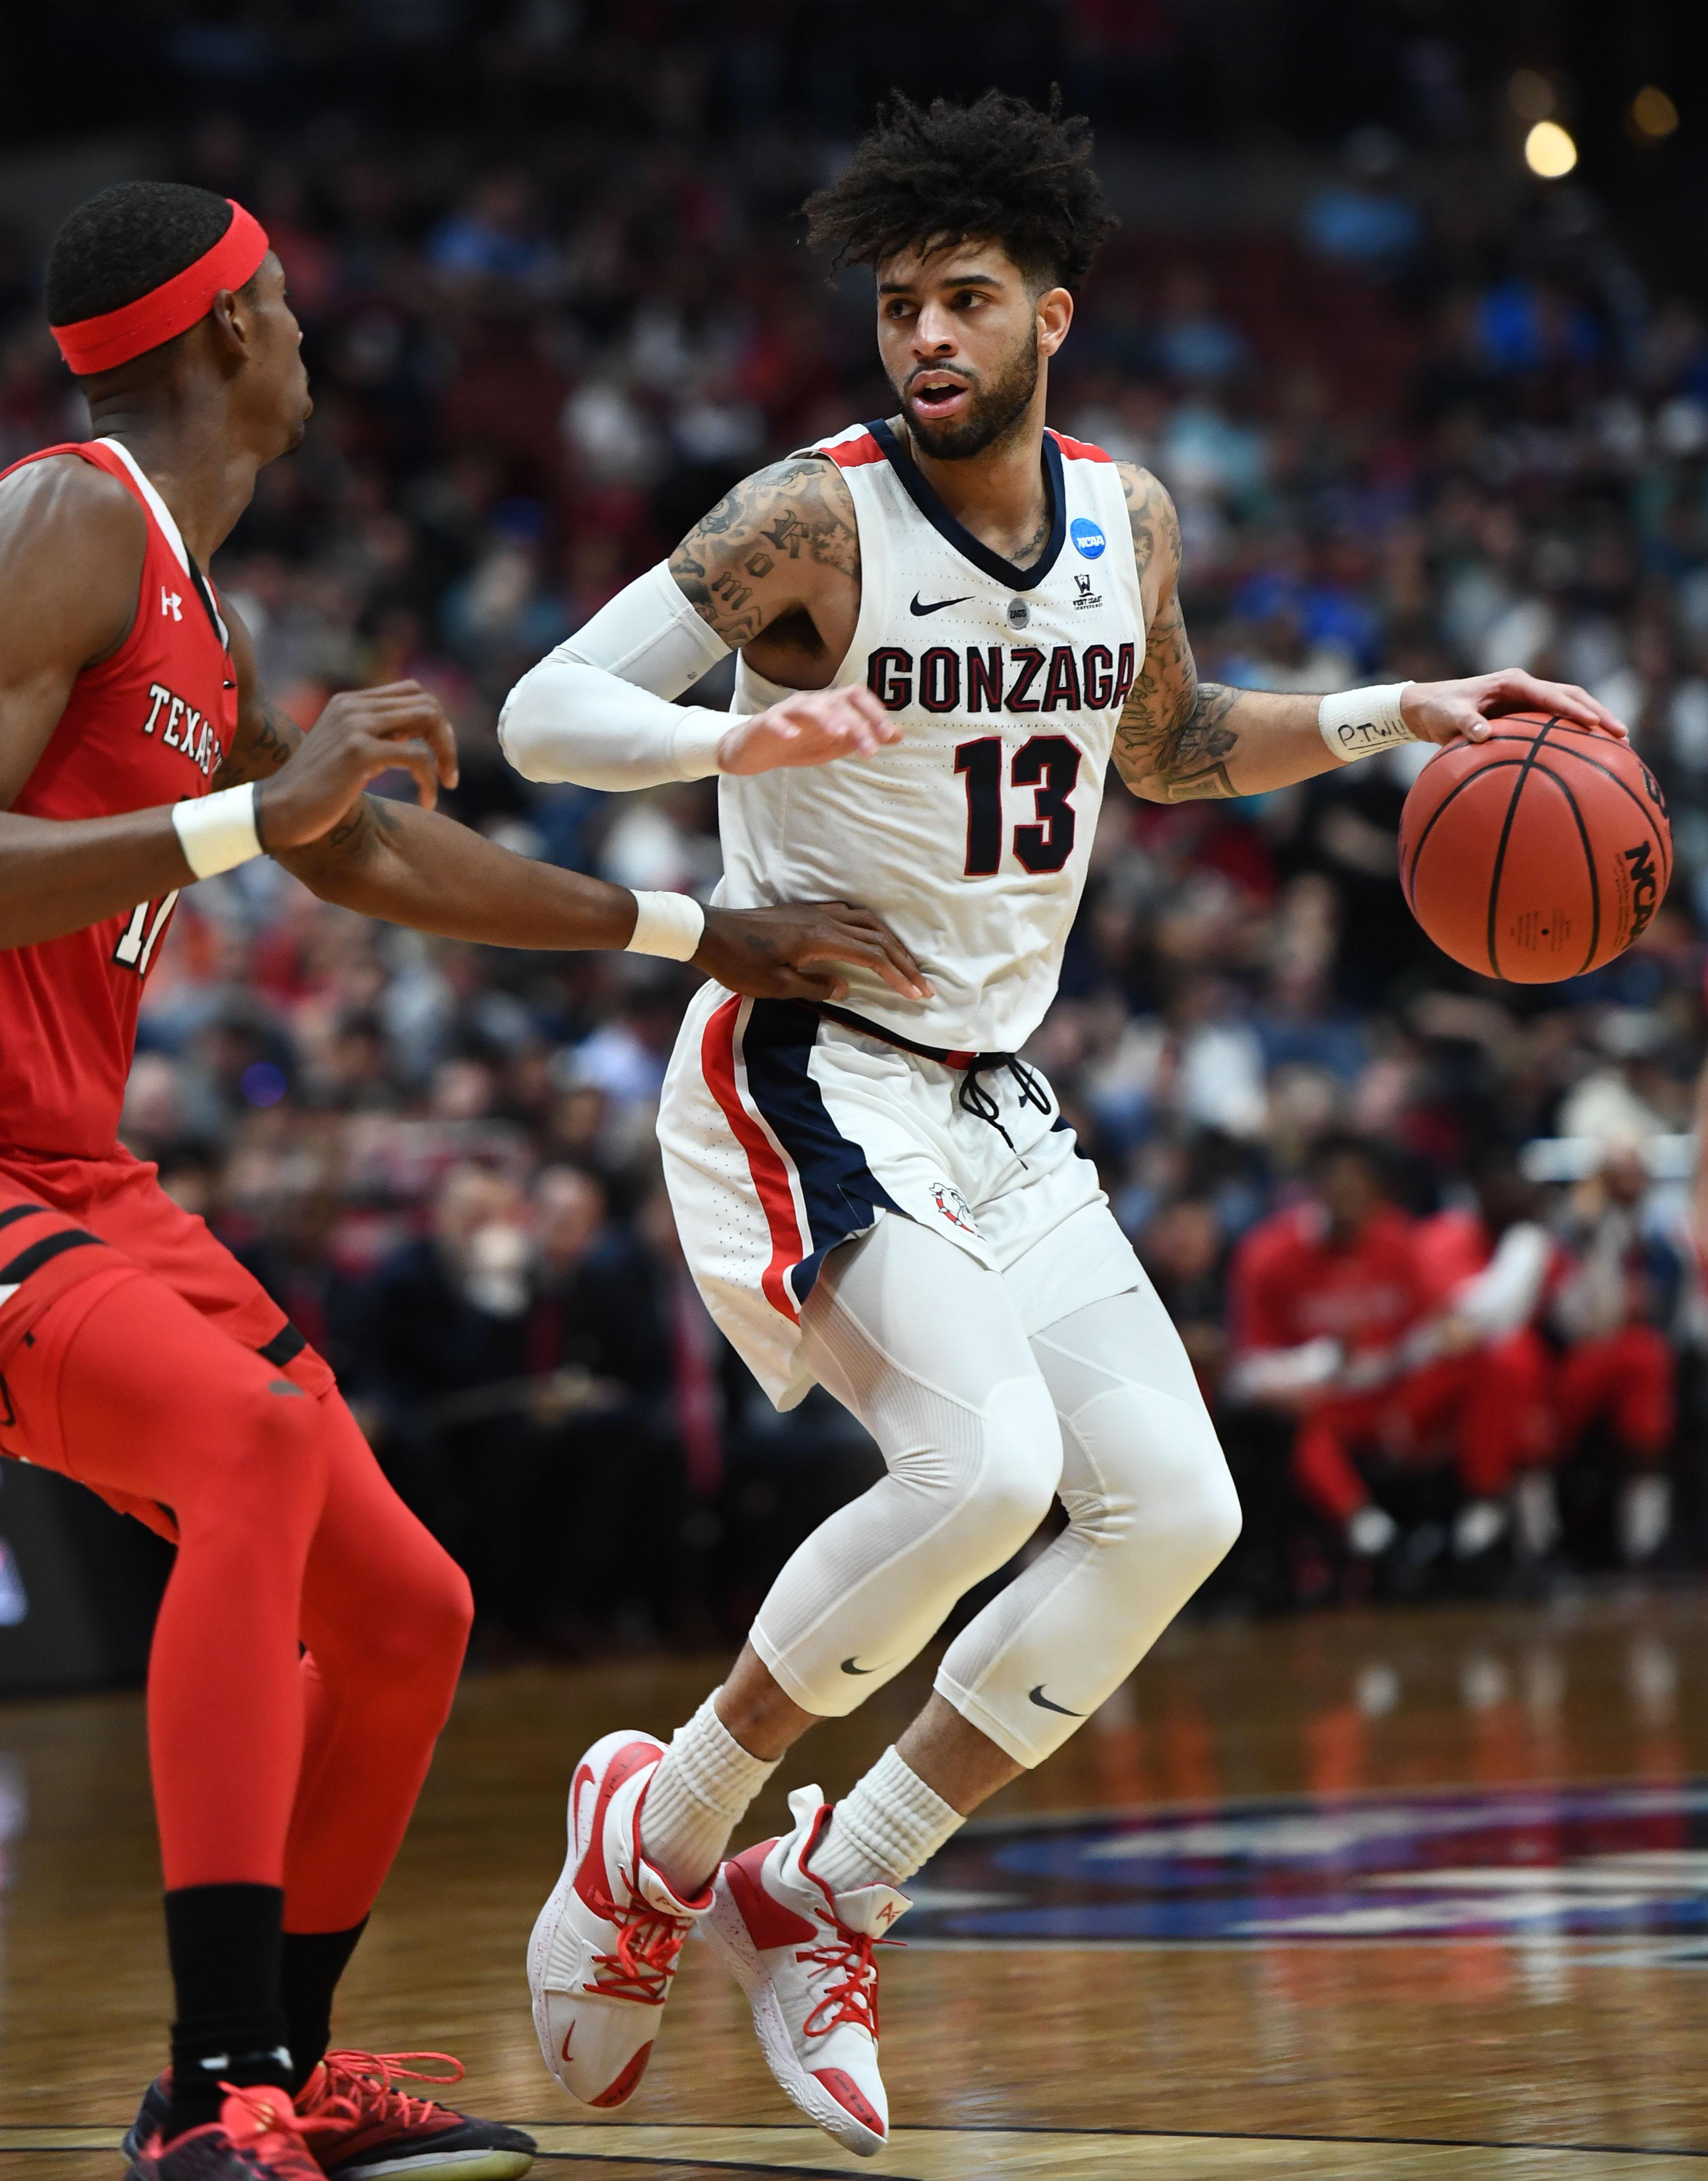 NCAA Basketball: NCAA Tournament-West Regional-Gonzaga vs Texas Tech